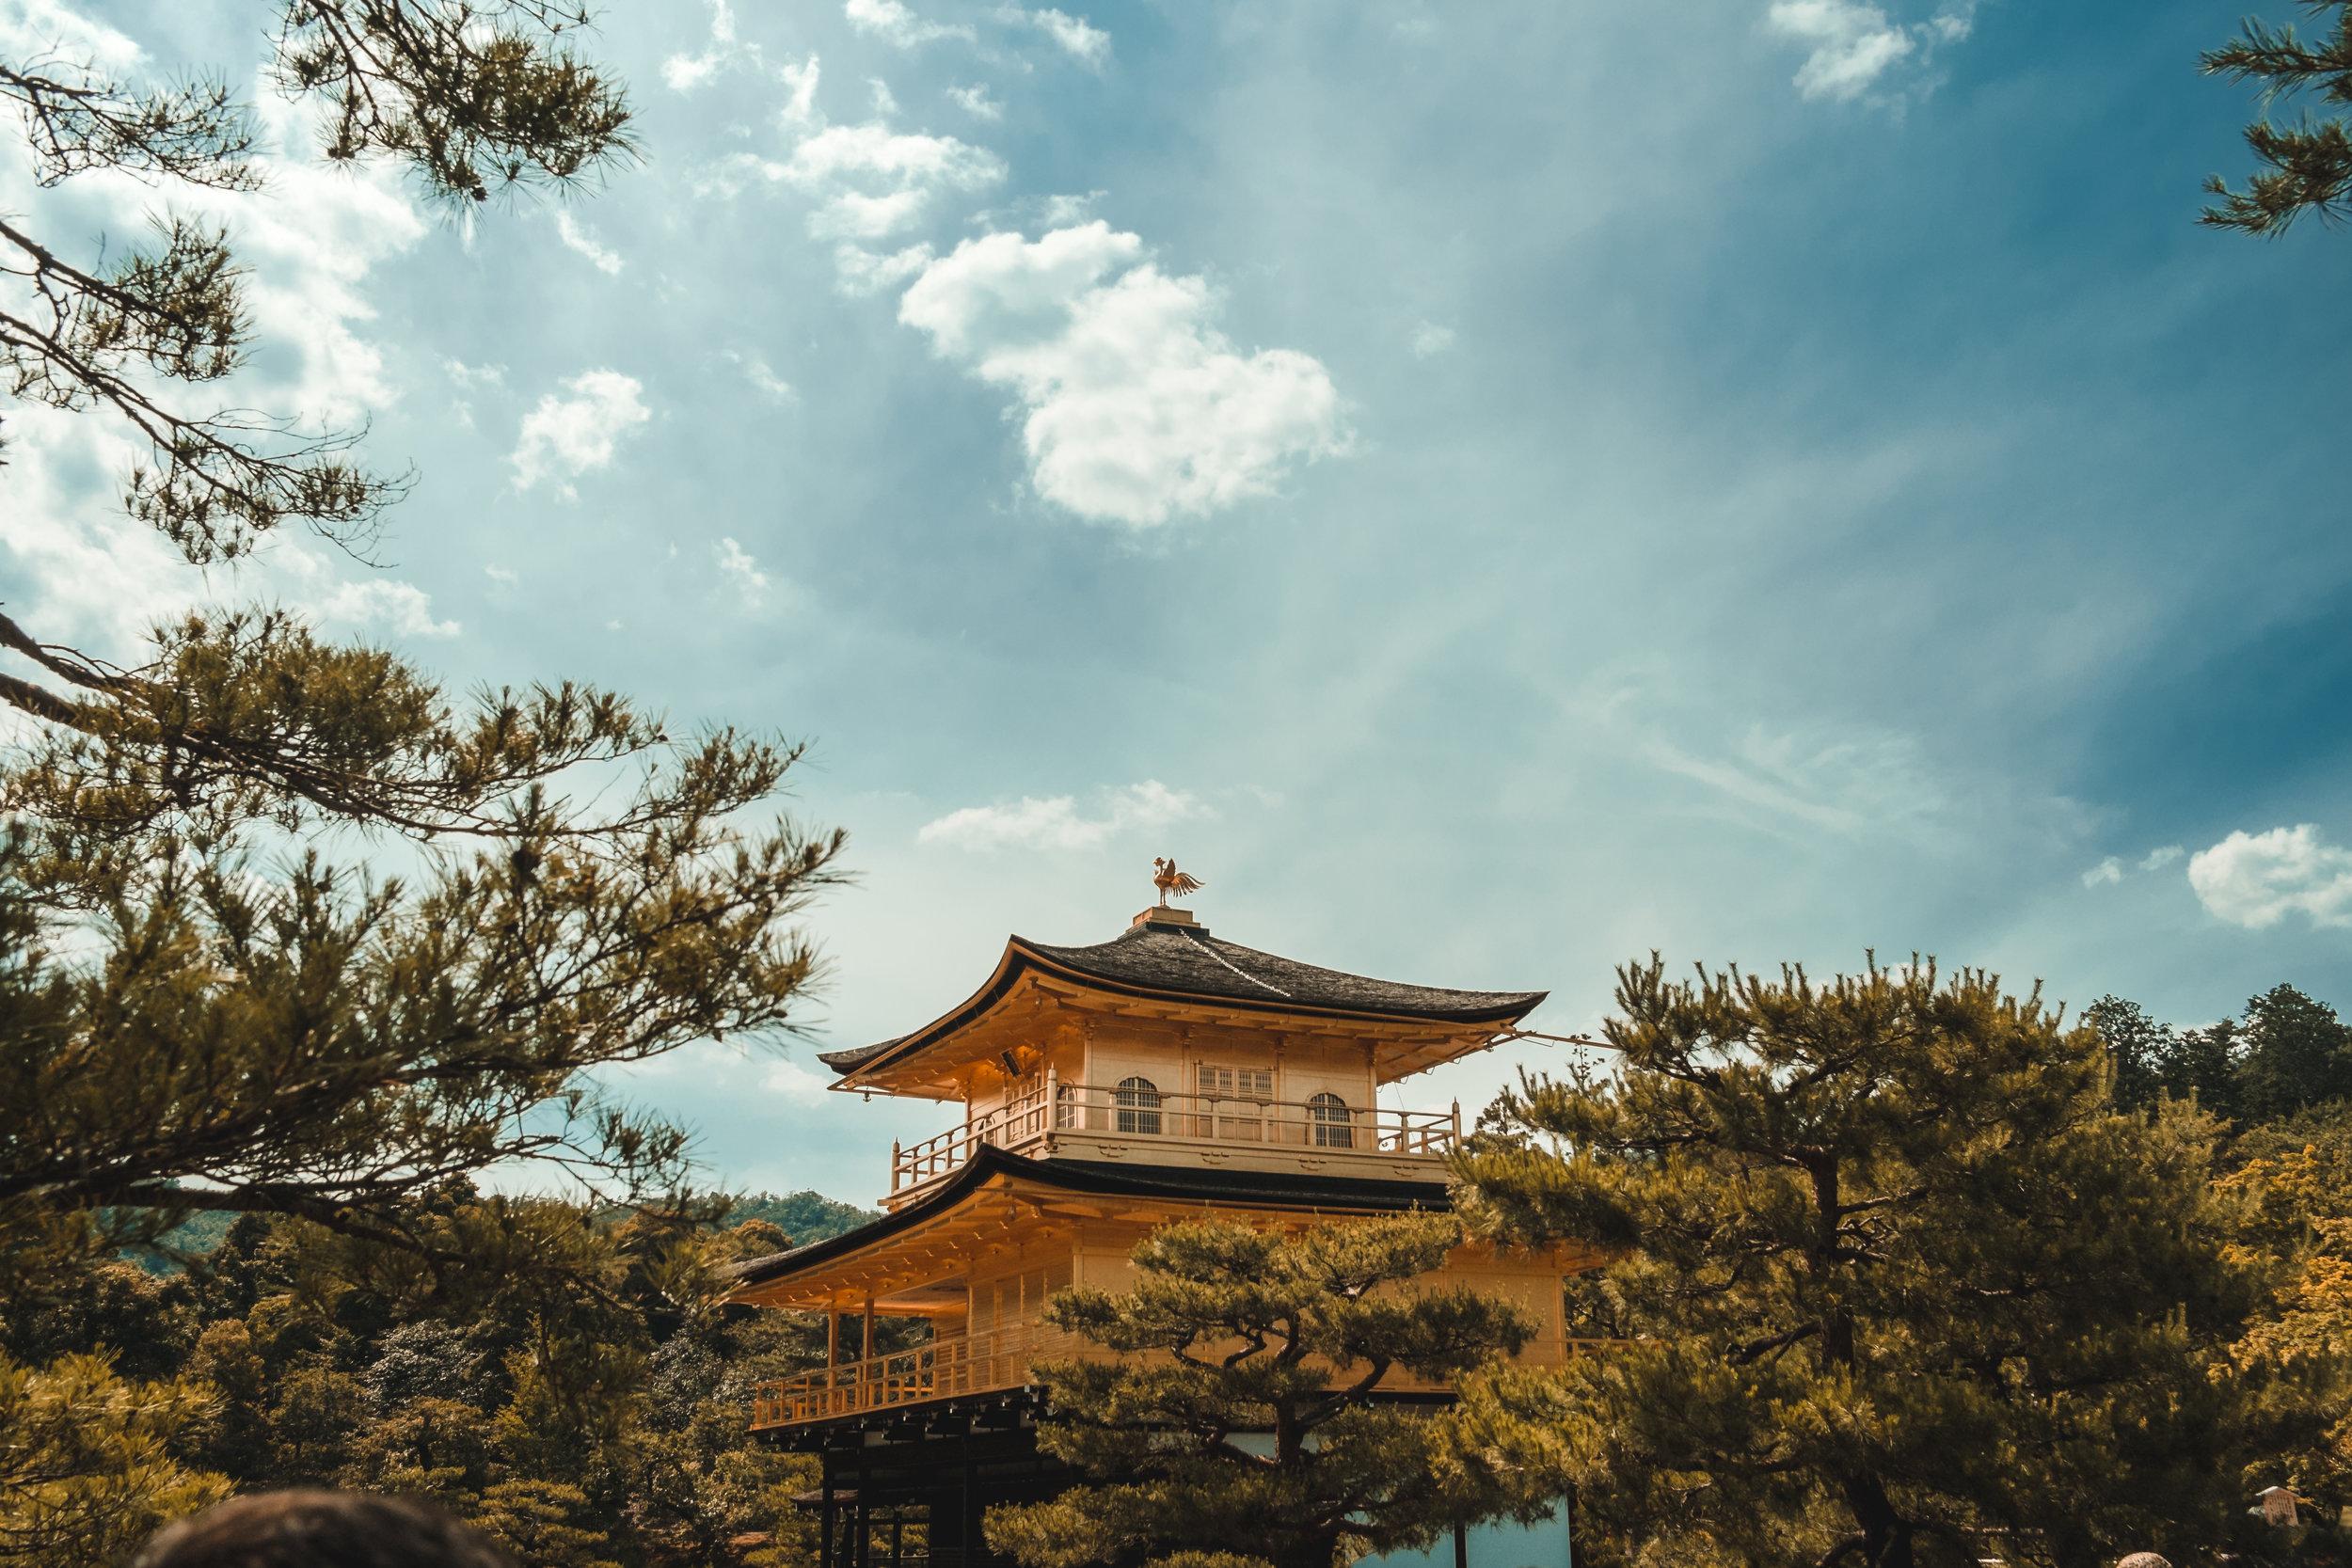 KyotoJapan_2018_AdamDillon_DSCF9952.jpg